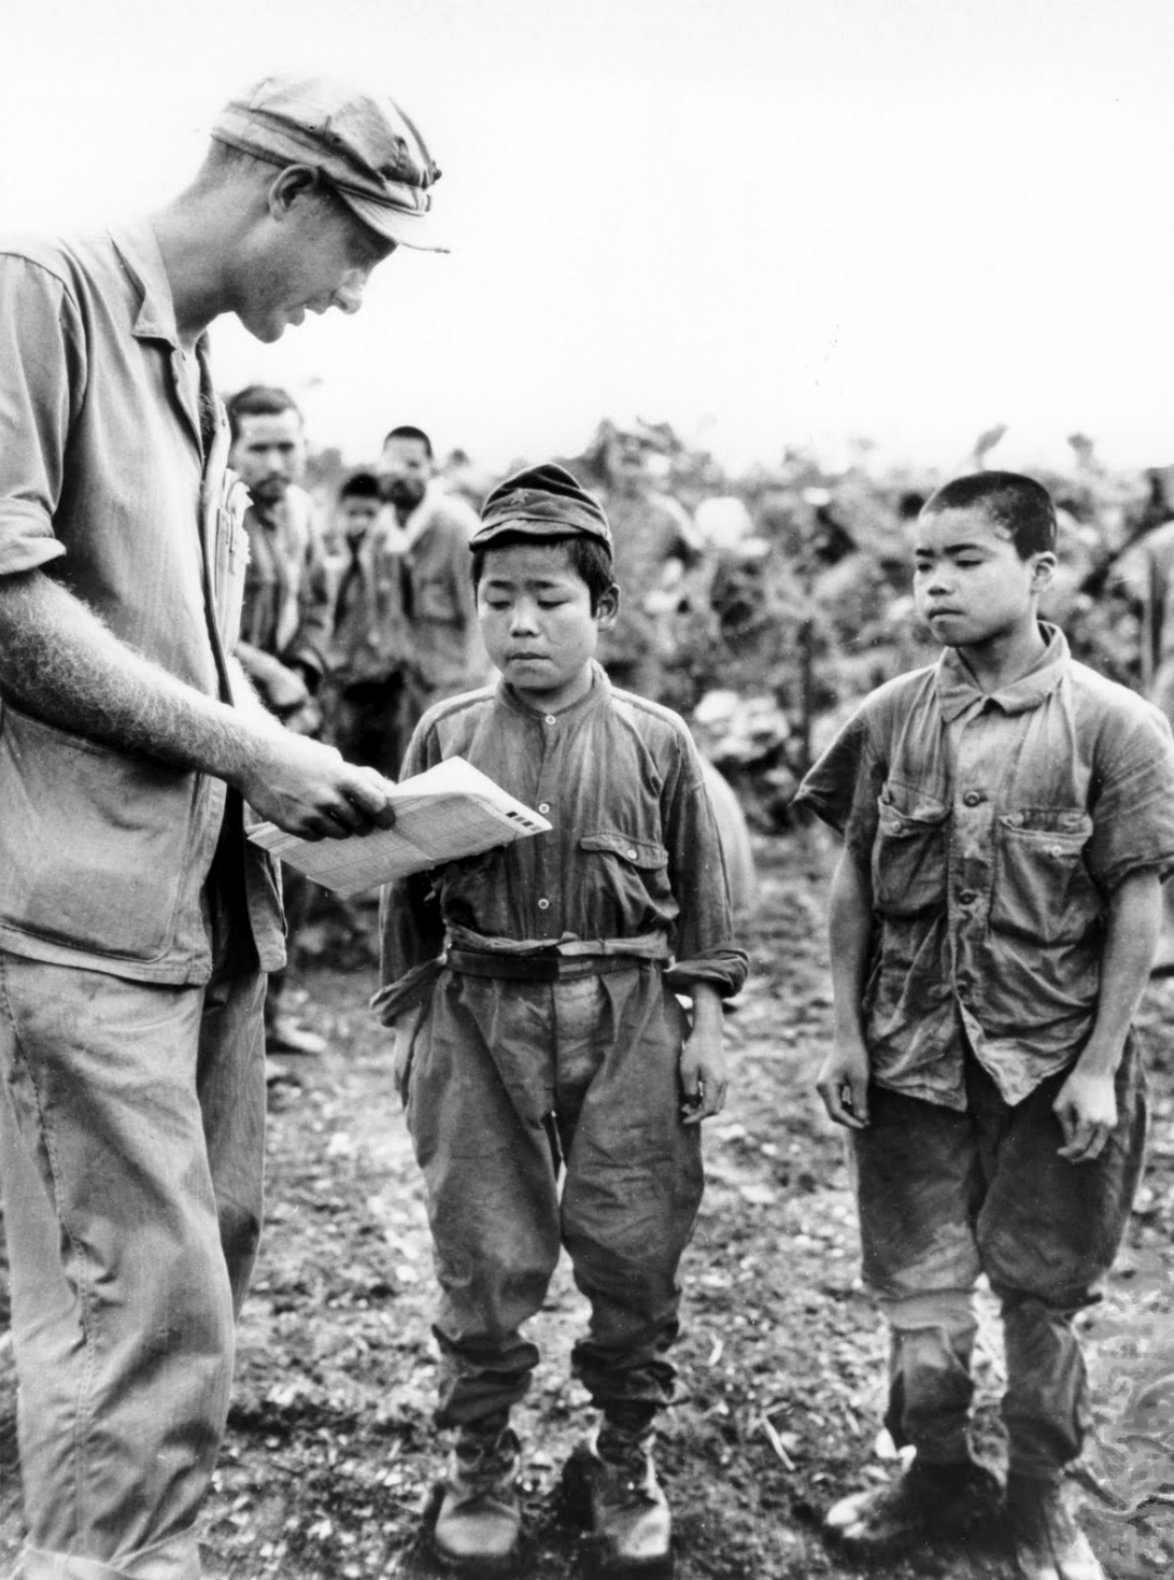 1945. június. U.S. Marine 1st Lt. Hart H. Spiegal própál kommunikálni két japán gyerekkatonával Okinawán..jpg